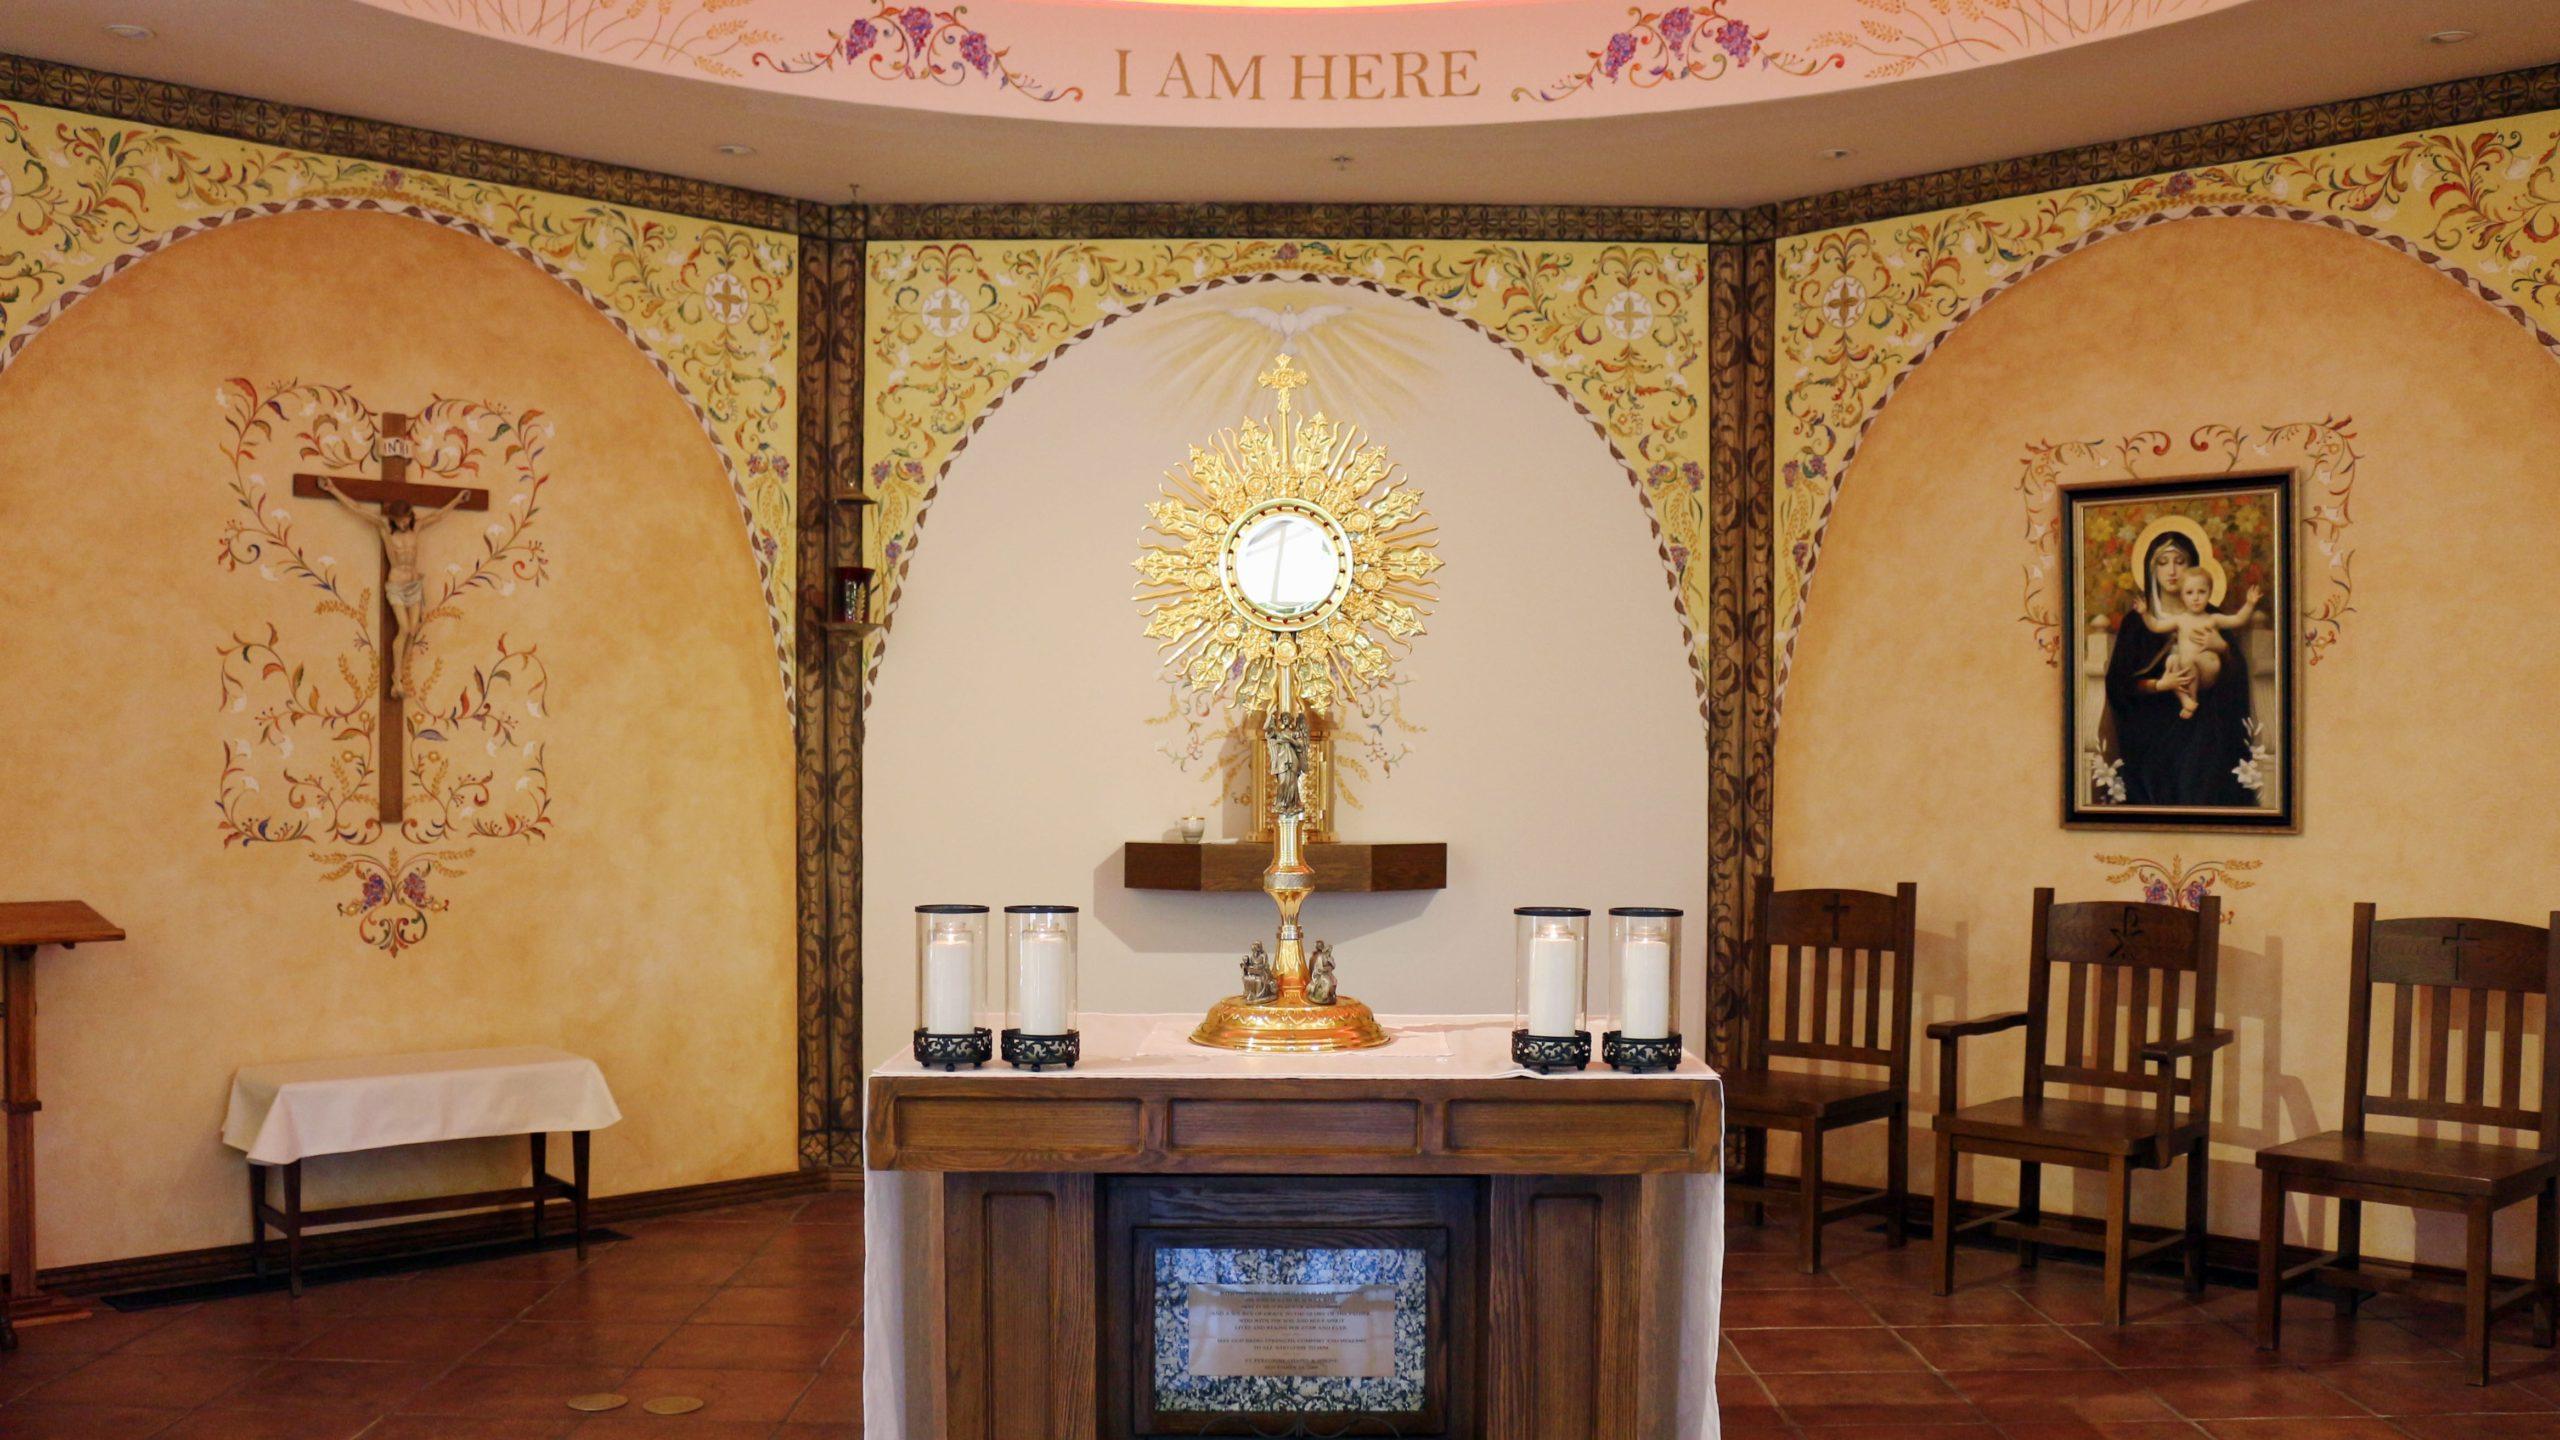 St. Peregrine Cancer Shrine